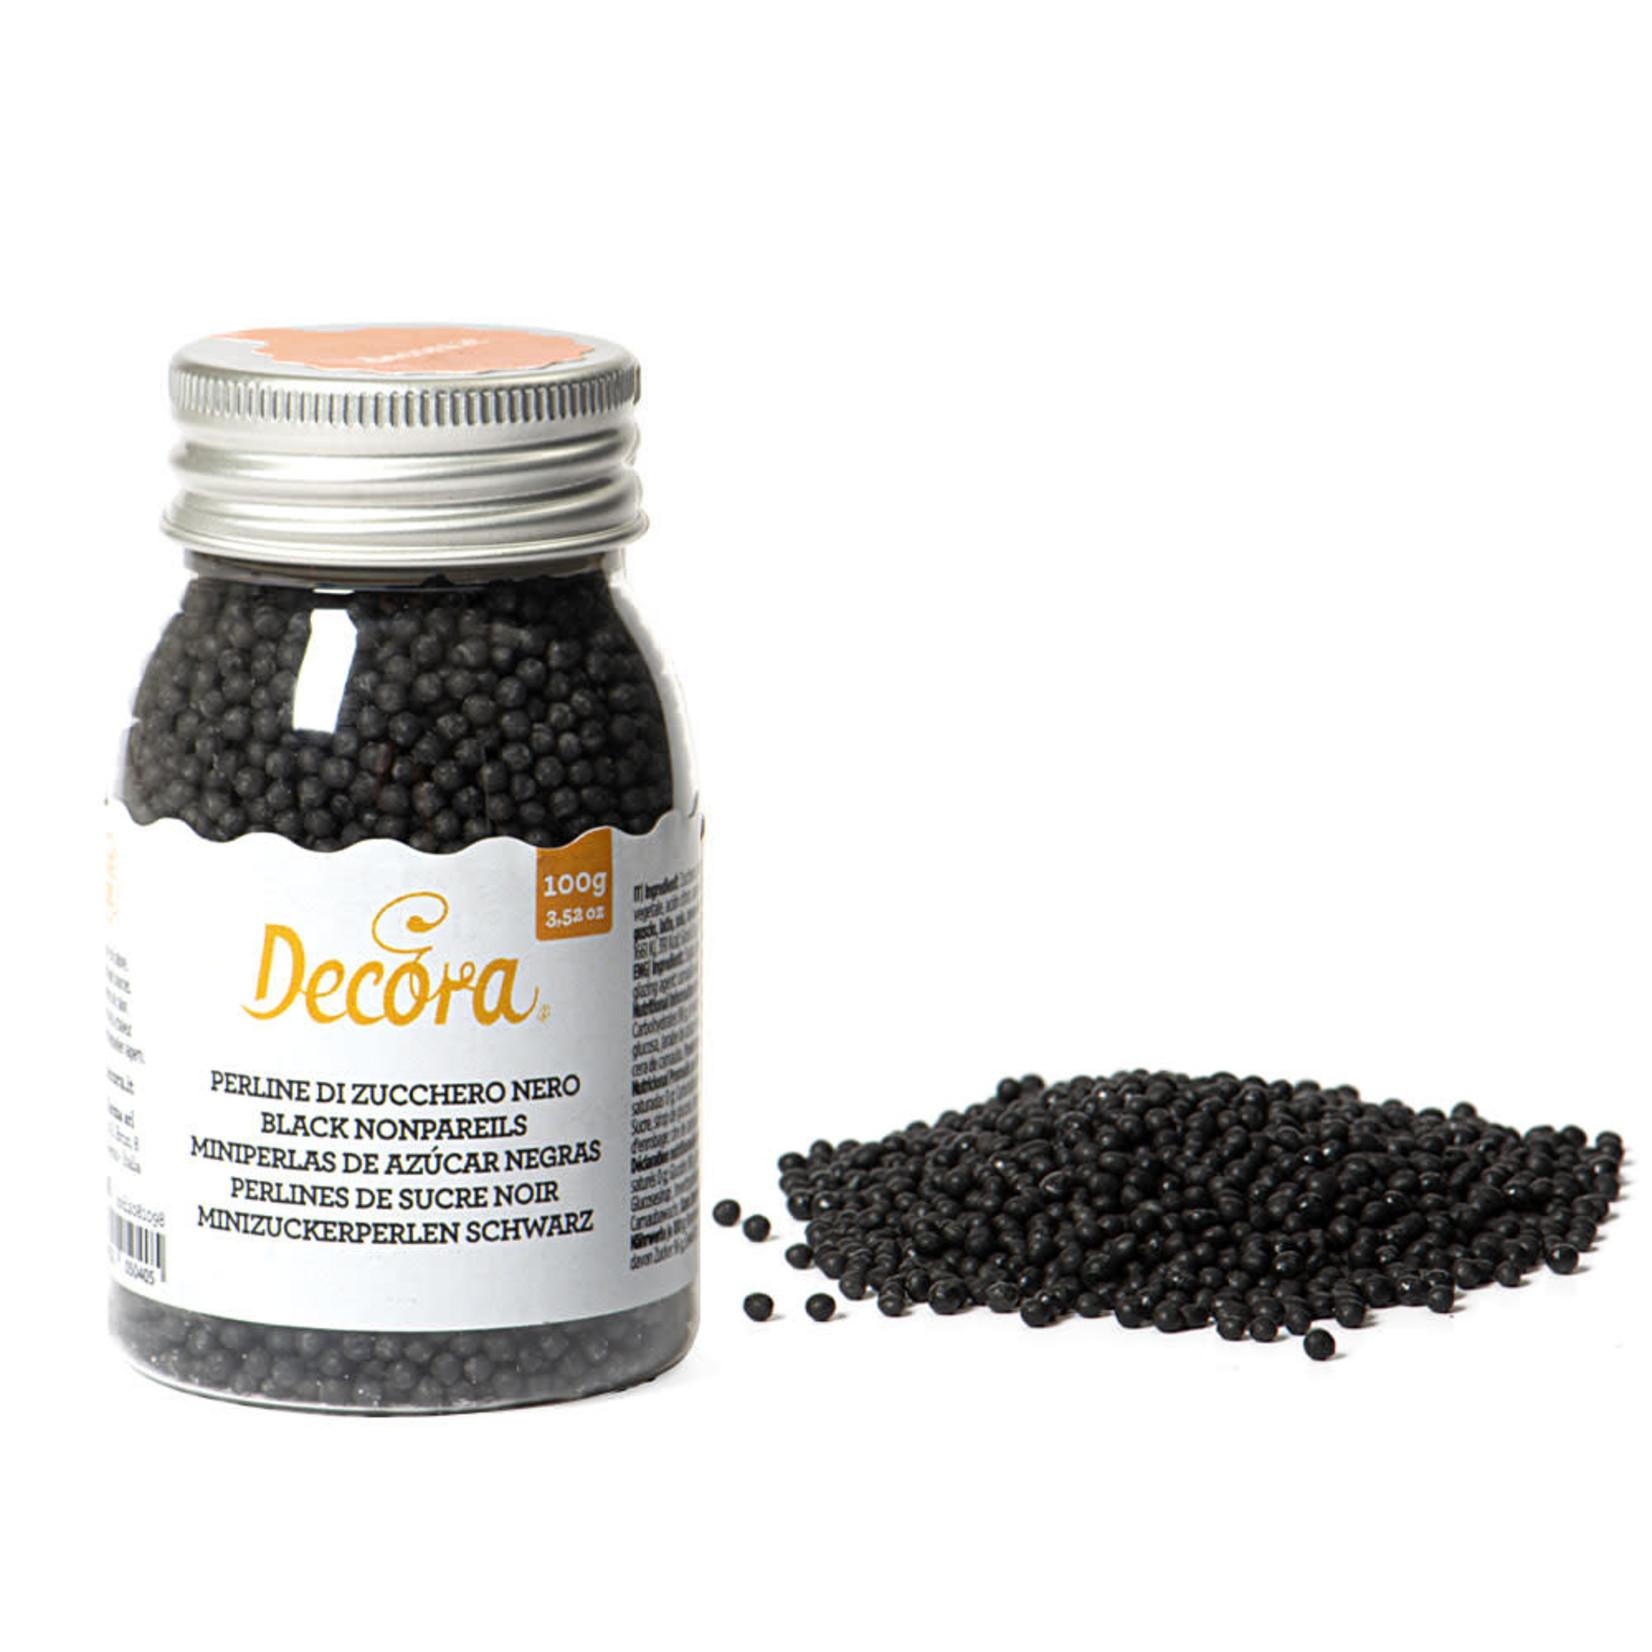 Decora pareltjes zwart 100g  /6